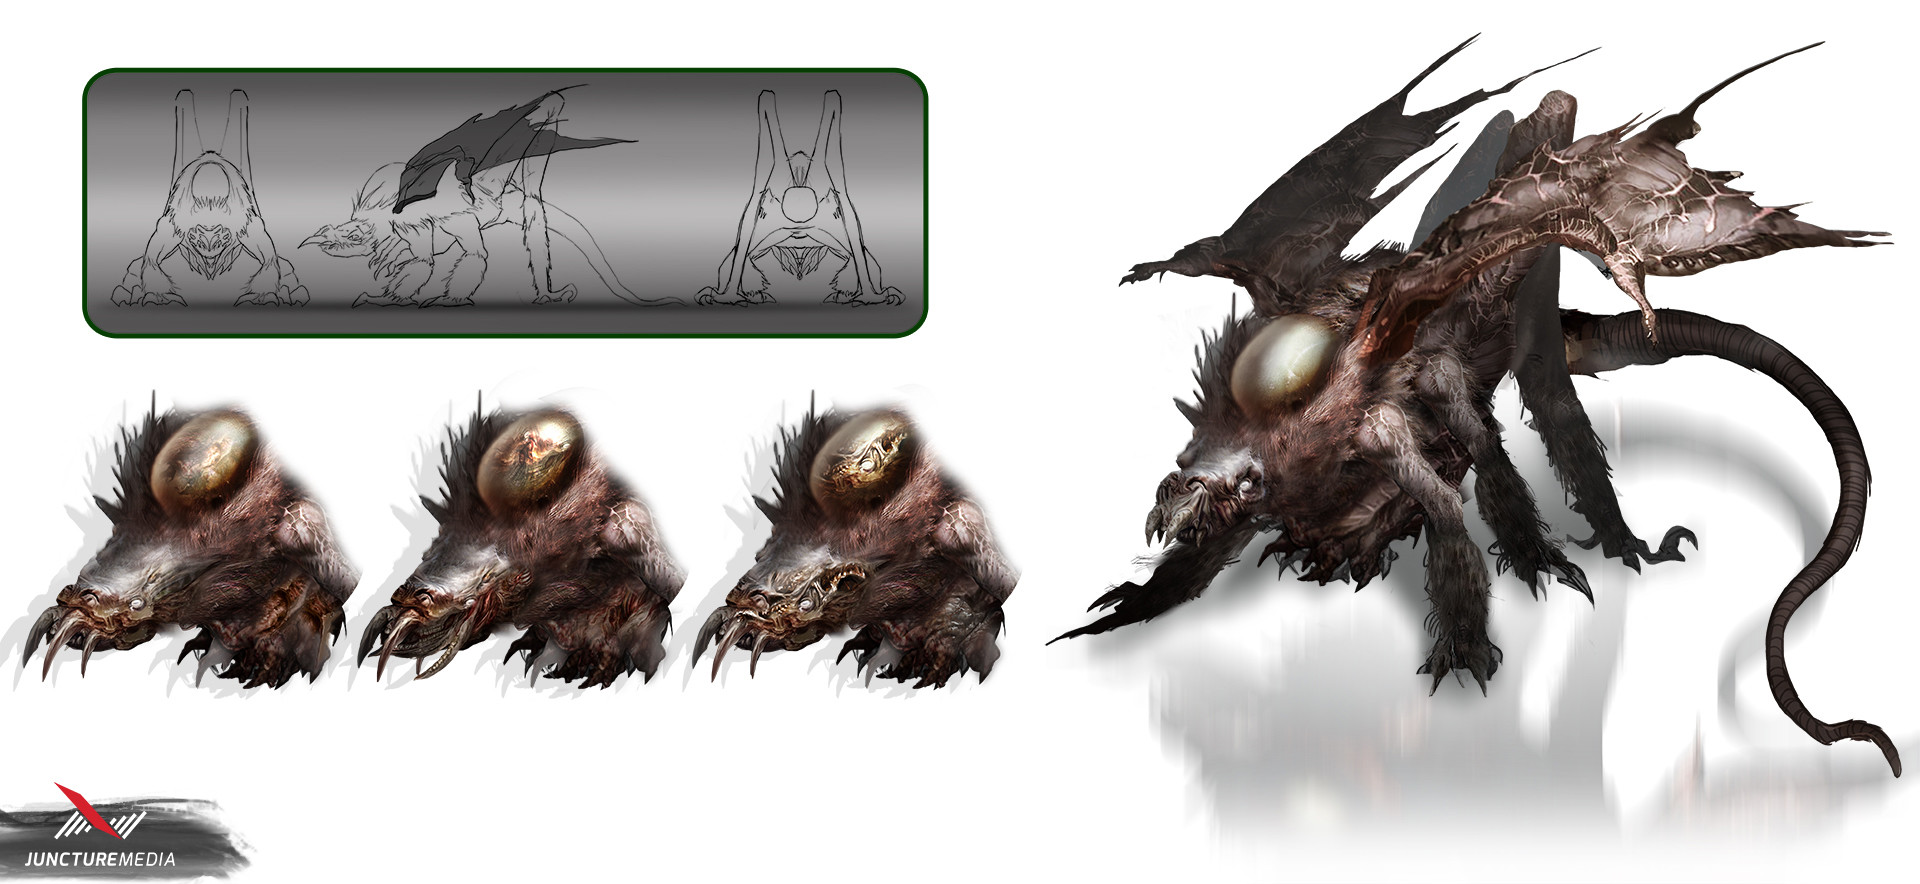 Hgntrung megacity monster avaria juncture media by juncture media da4ret8